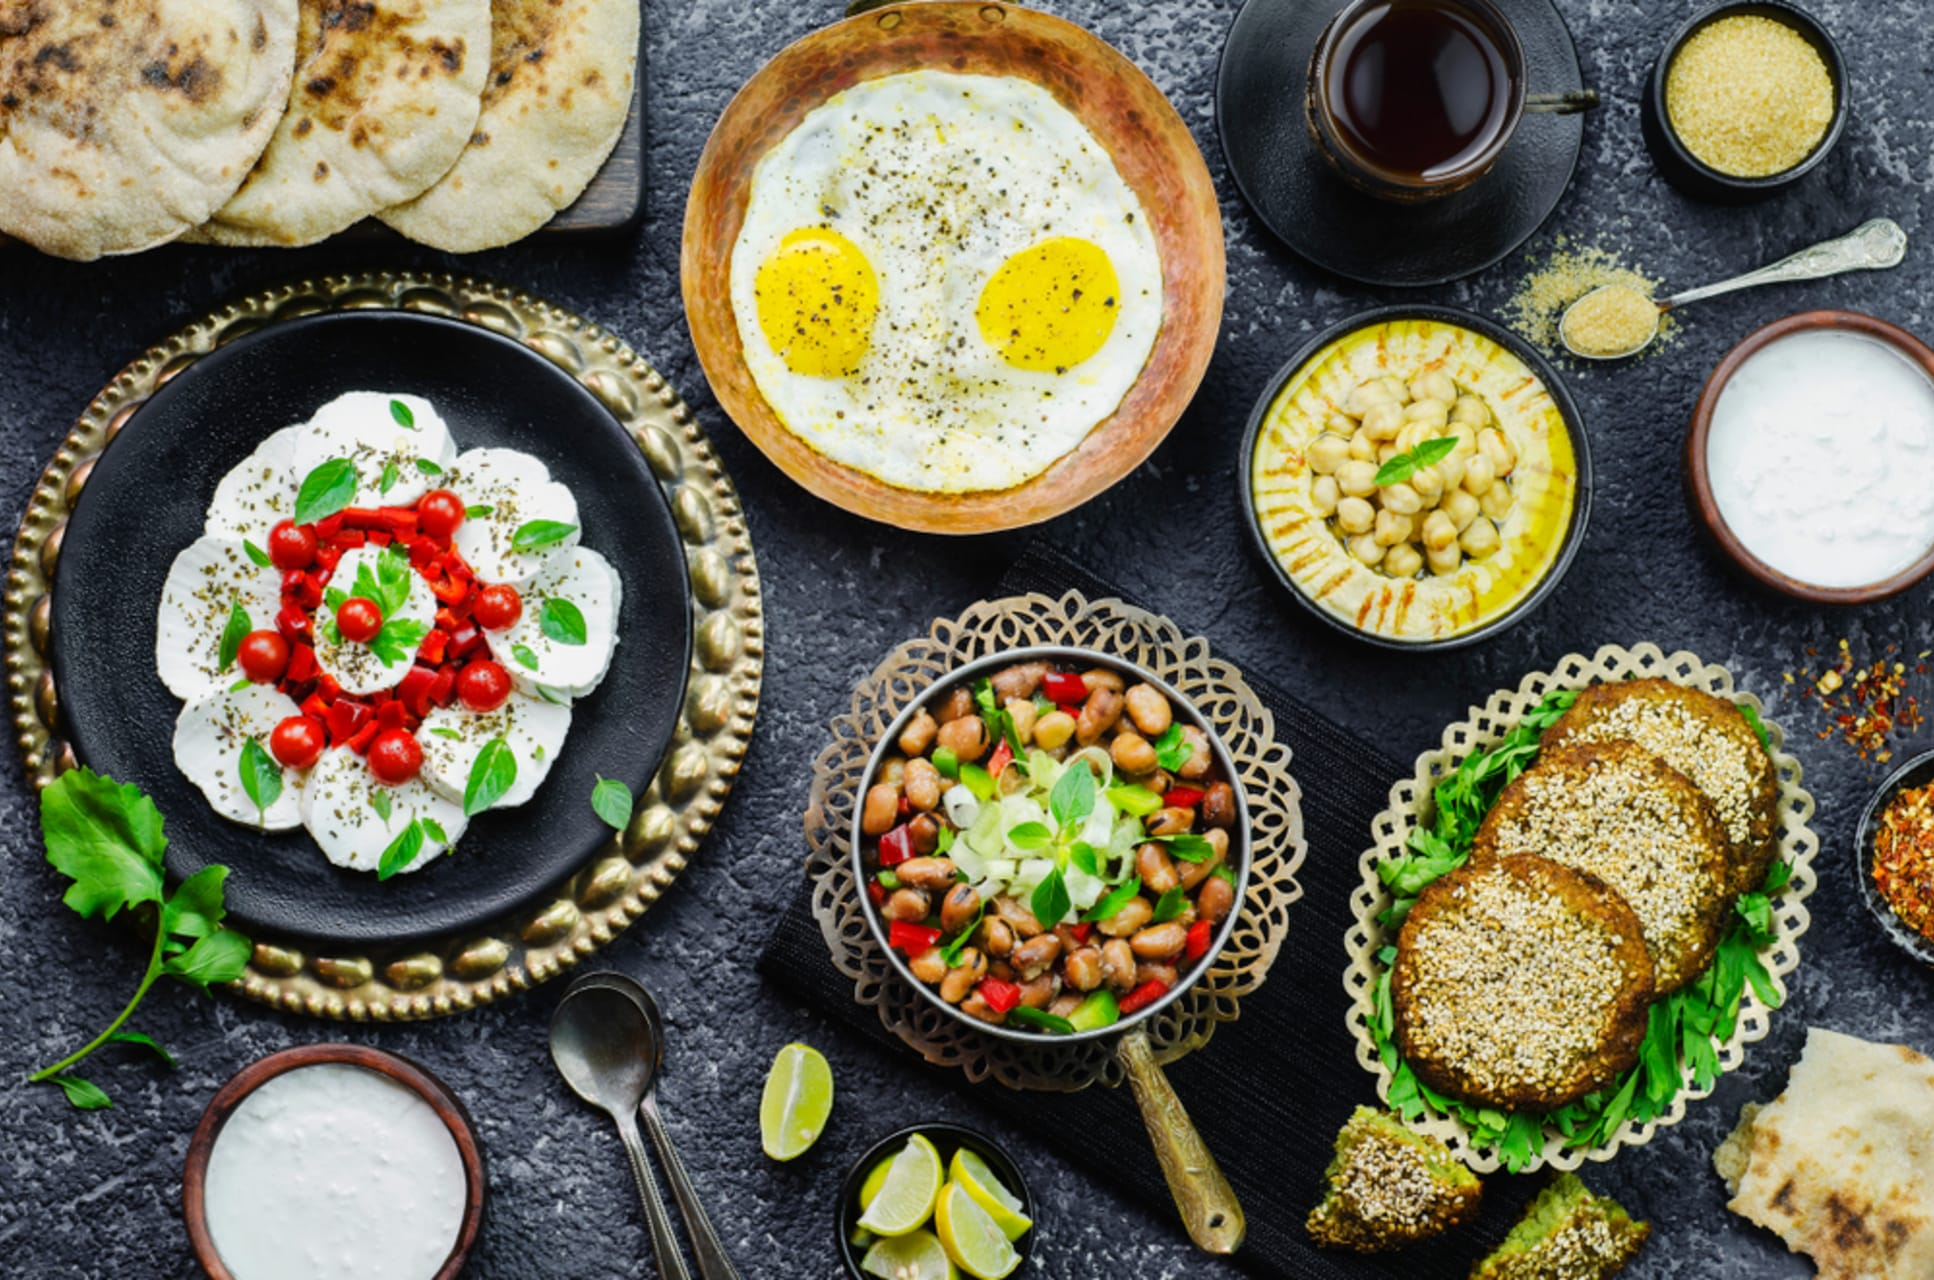 Luxor - Making an Egyptian breakfast